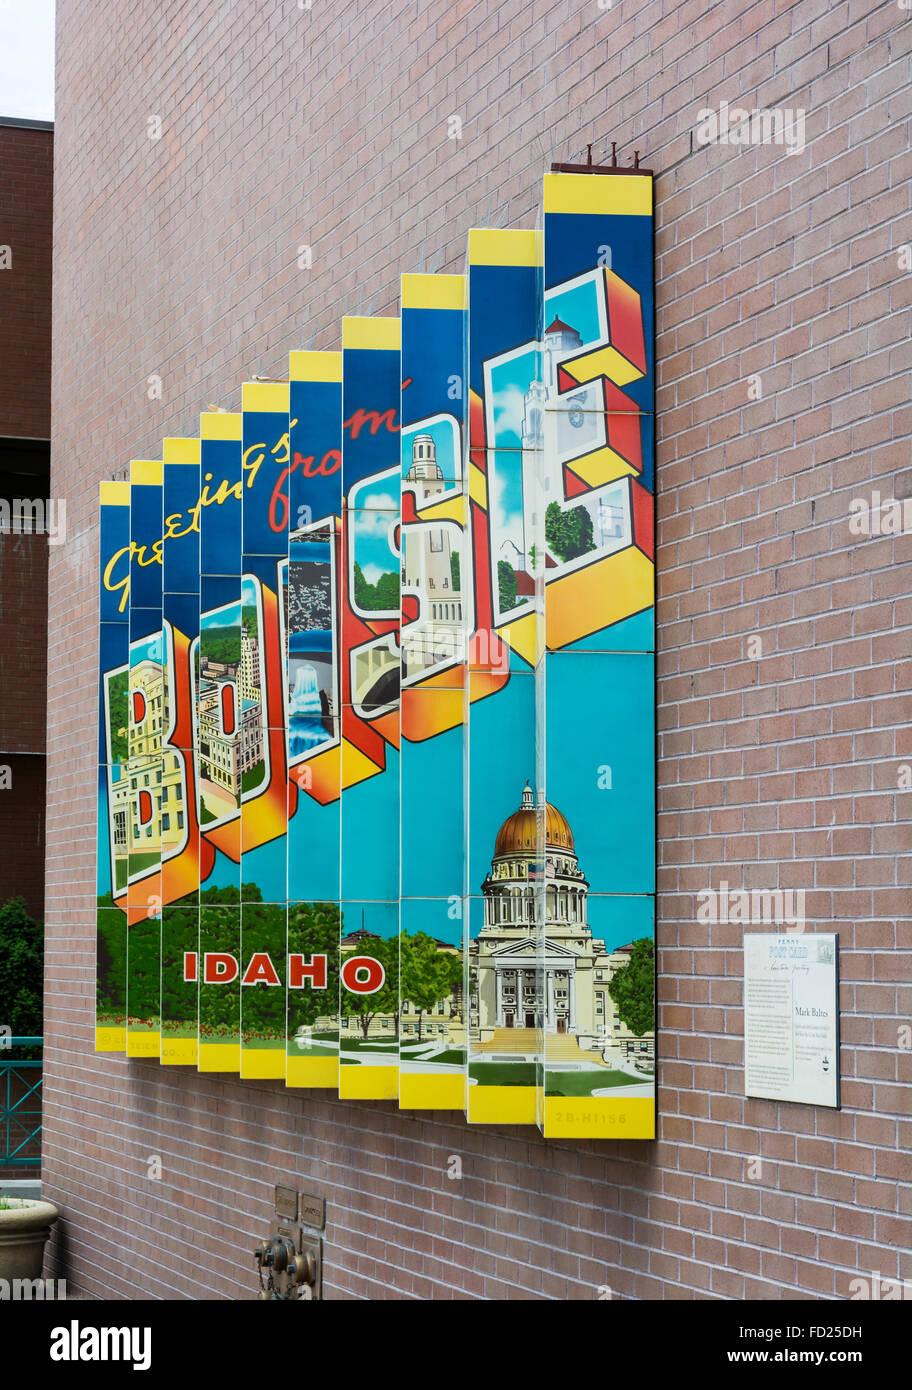 Idaho, Boise, 'Penny Postcard' public artwork dual face picture plane mural - Stock Image